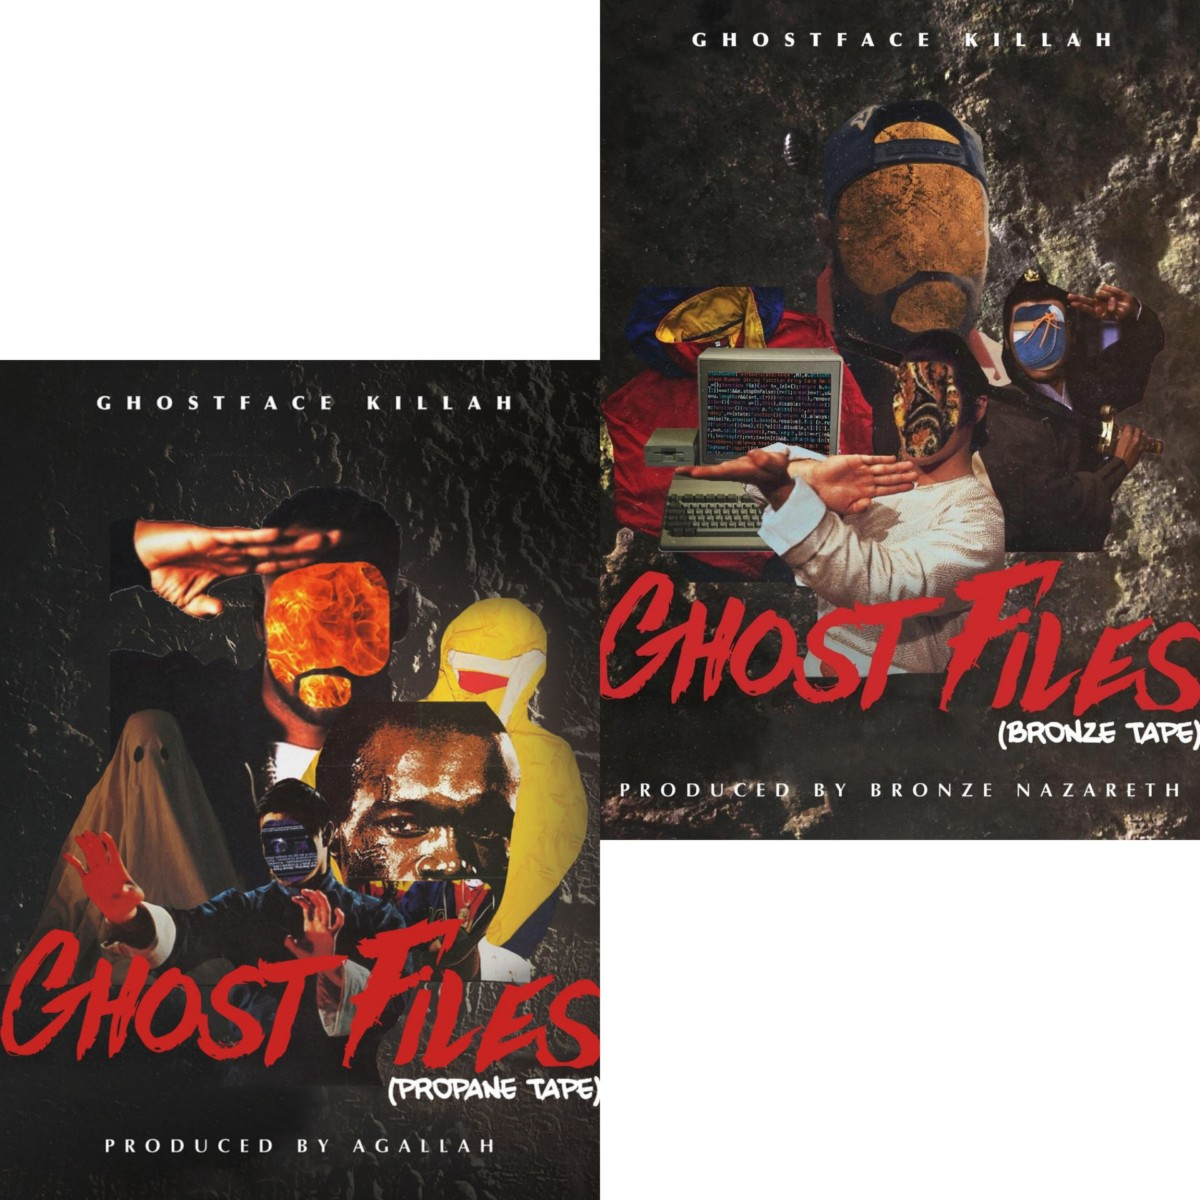 Ghostface Killah — «Ghost Files: Propane Tape / Bronze Tape»